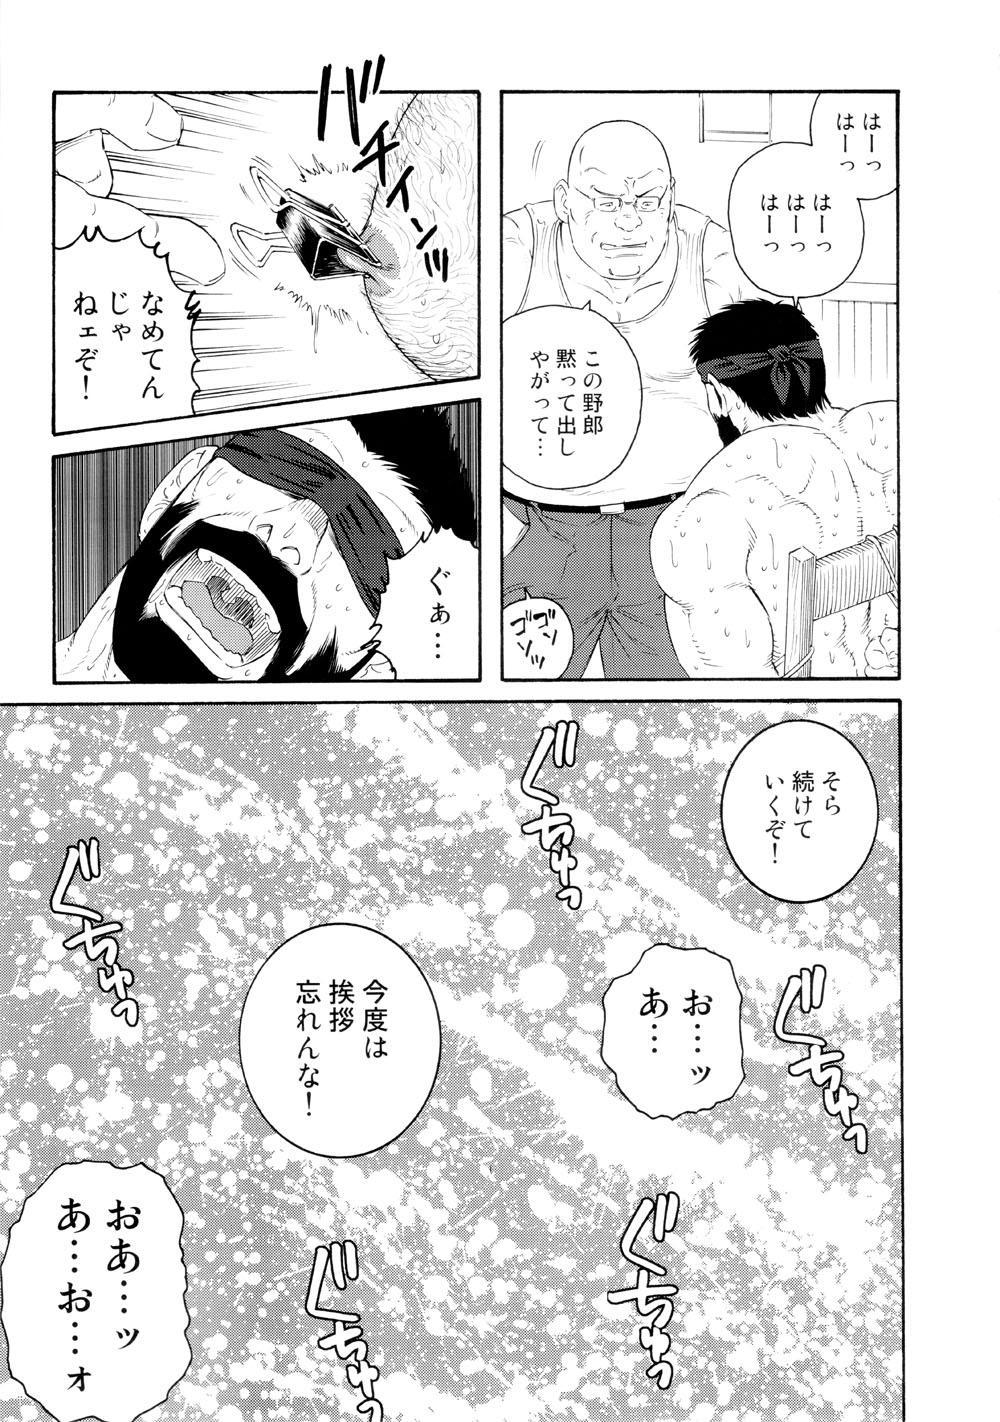 Genryu Chapter 3 14